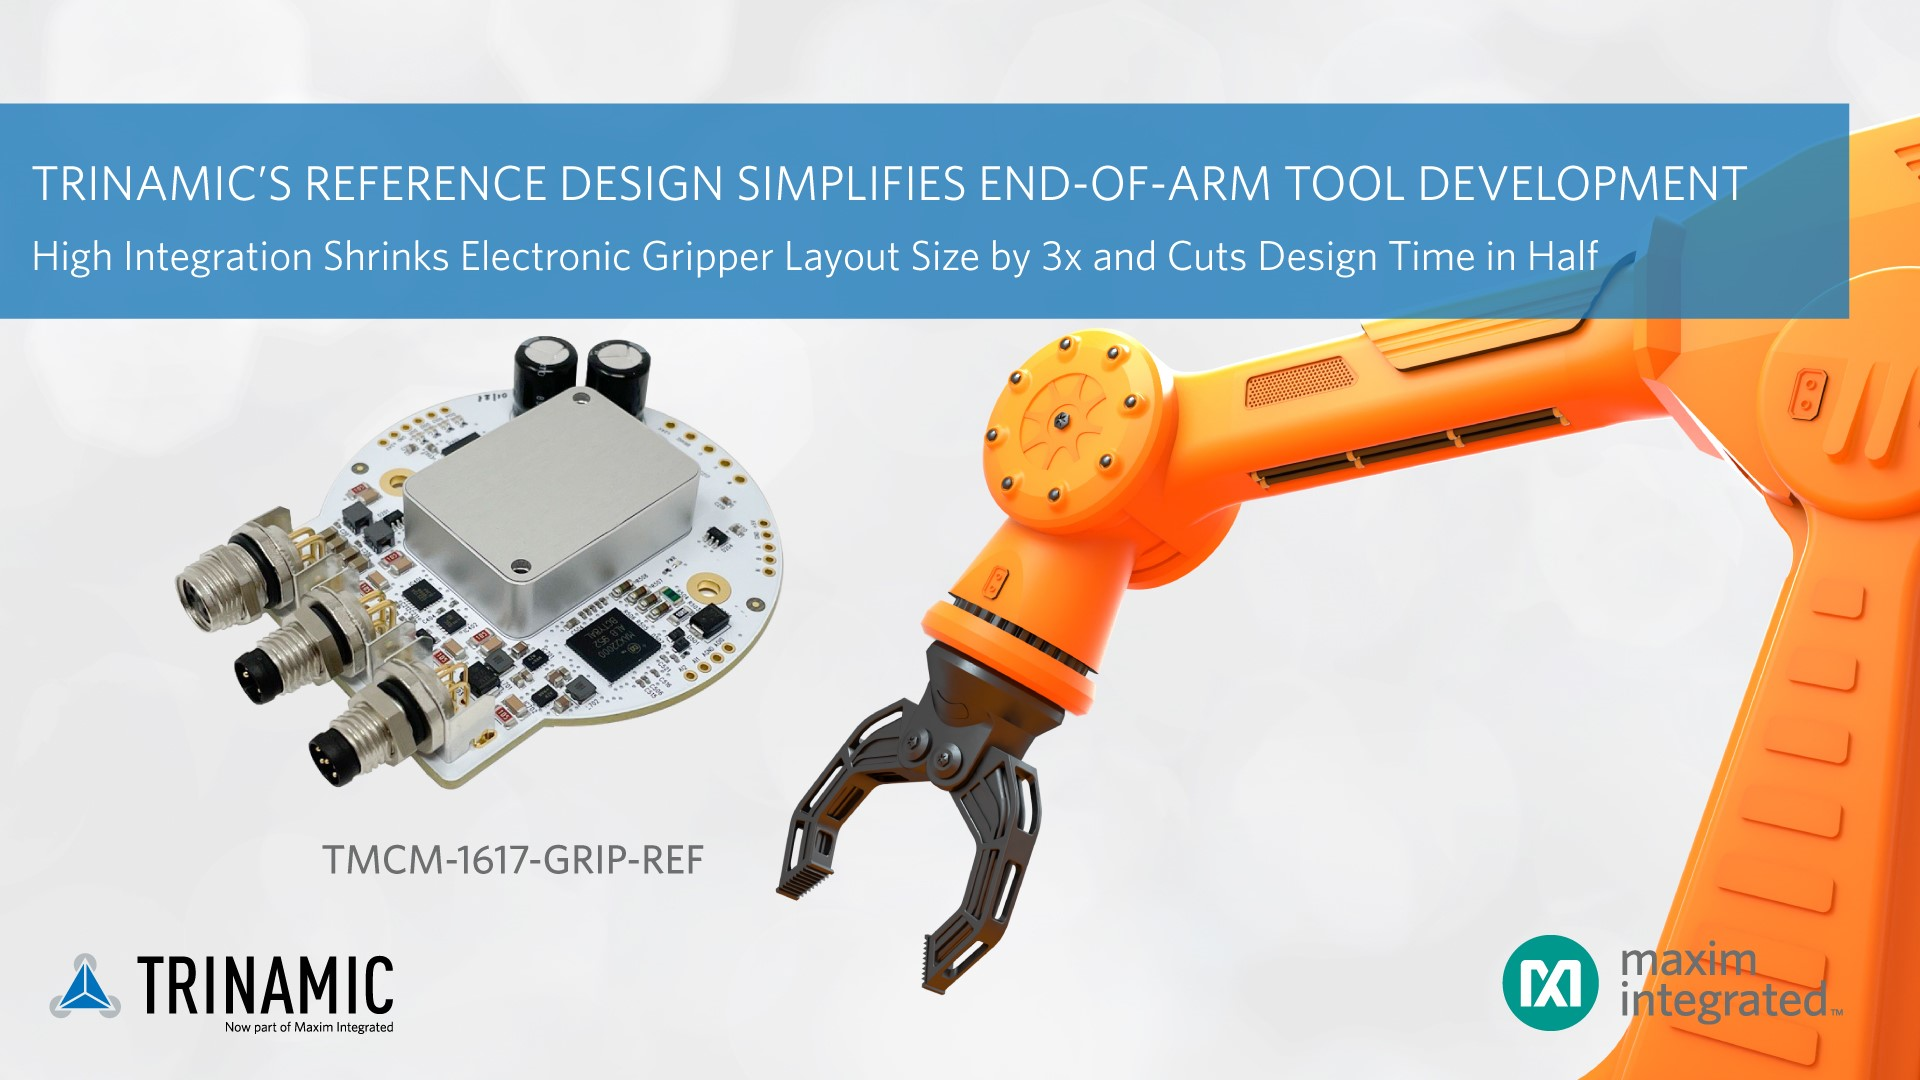 Maxim Integrated发布Trinamic开源参考设计,大幅缩减机械臂尺寸并加速其开发进程